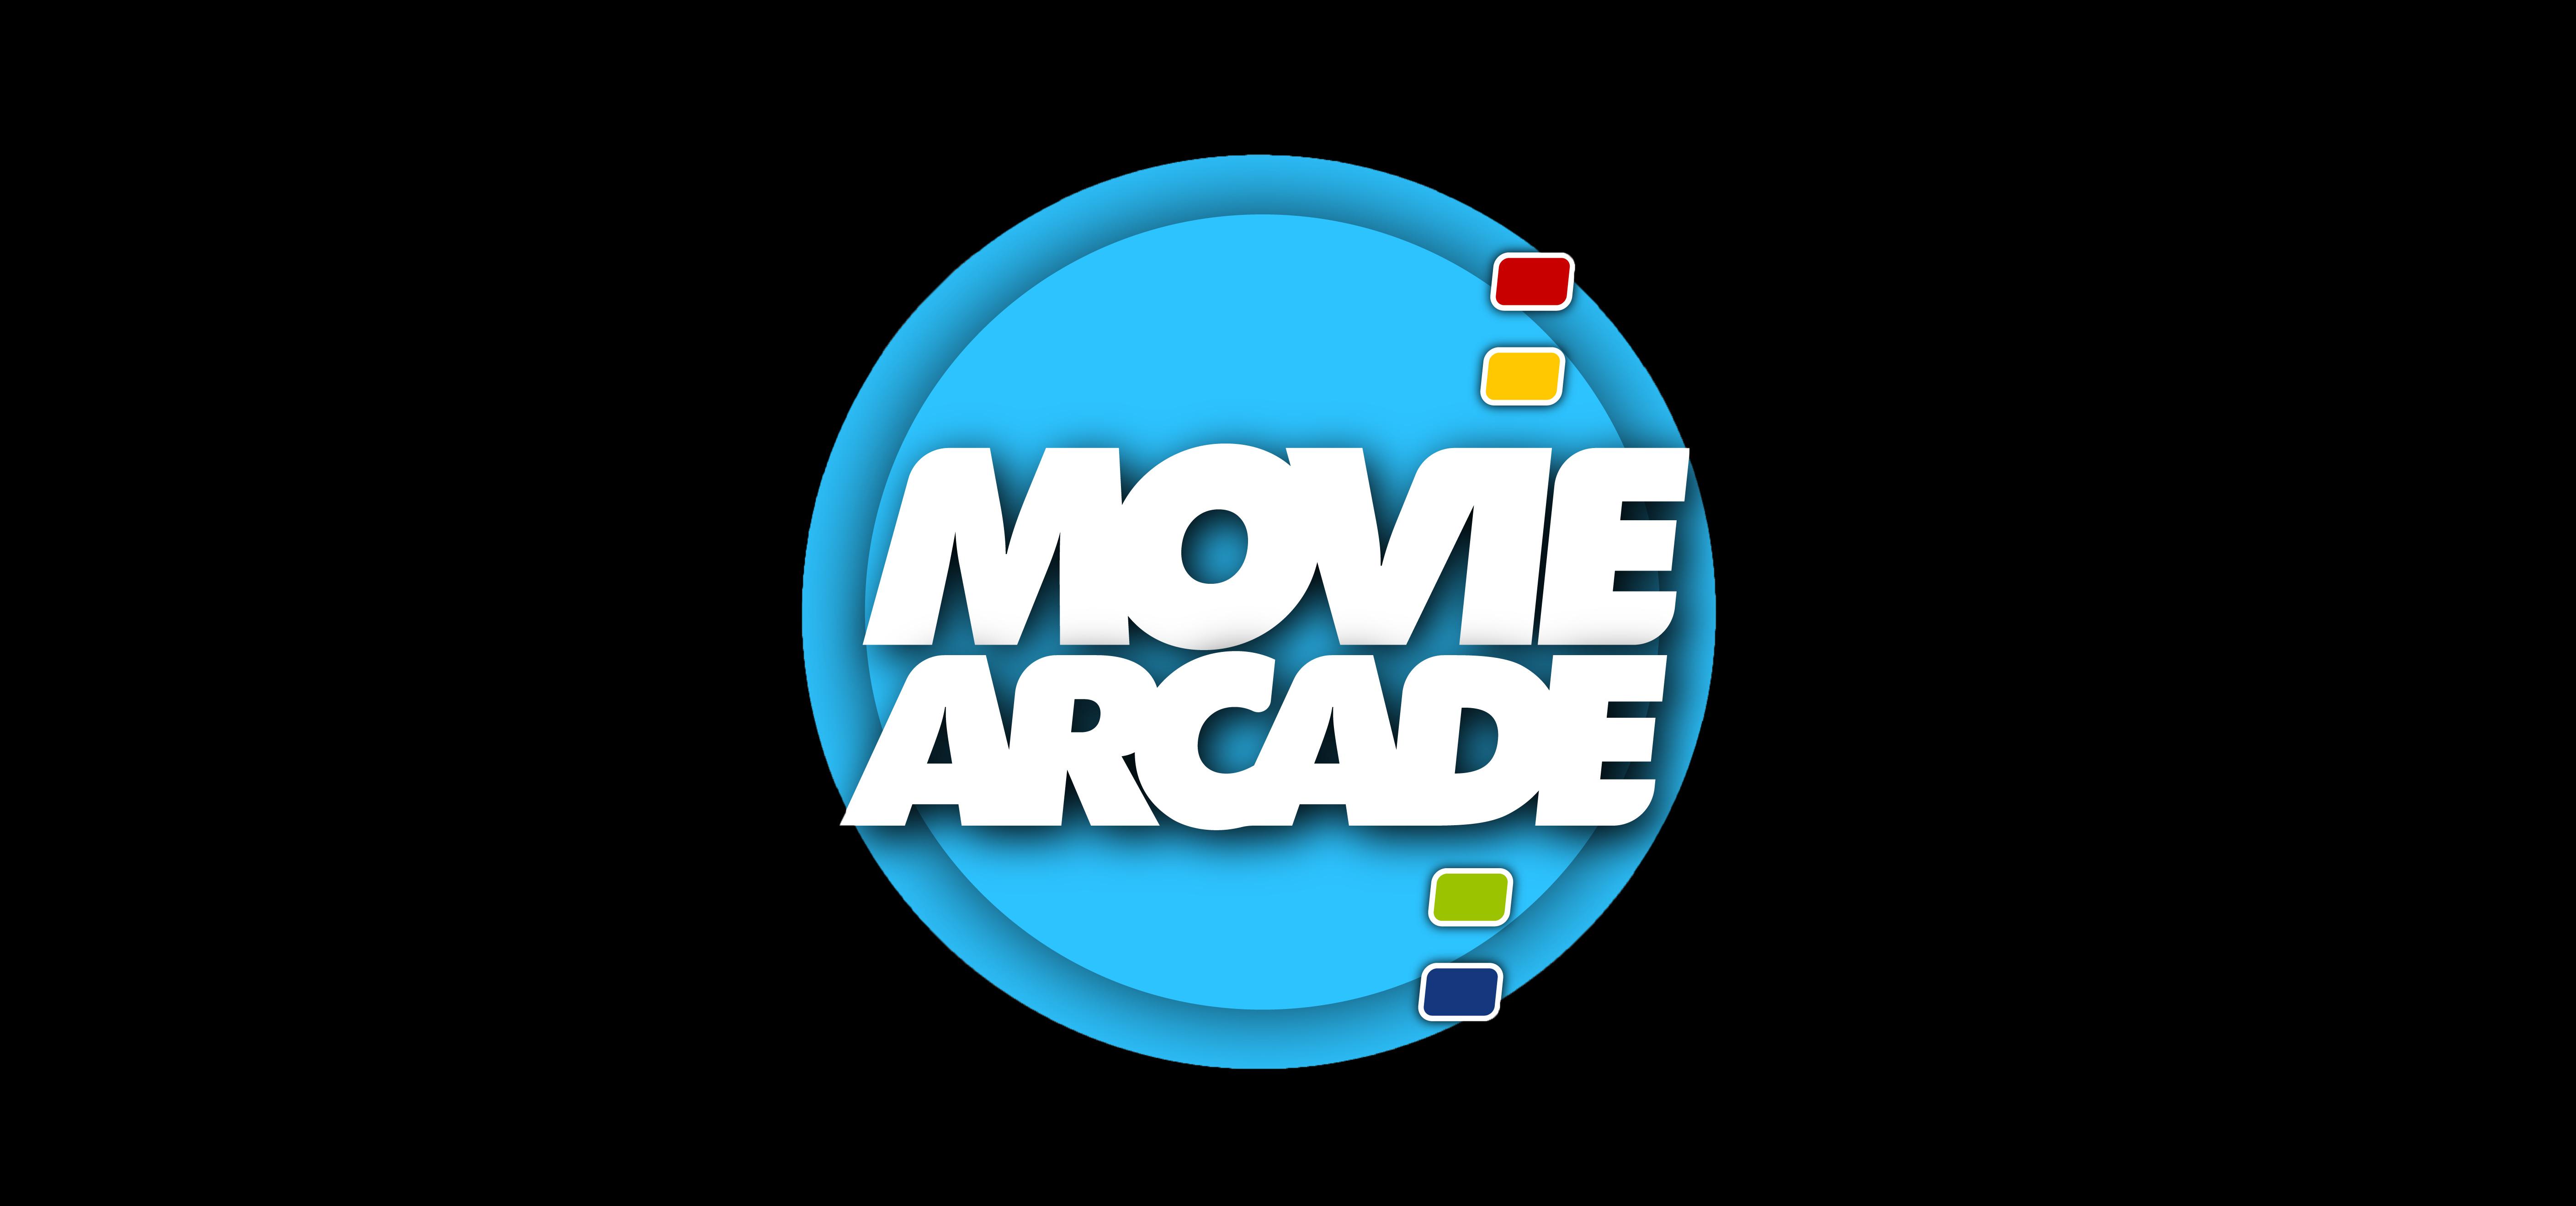 Movie Arcade